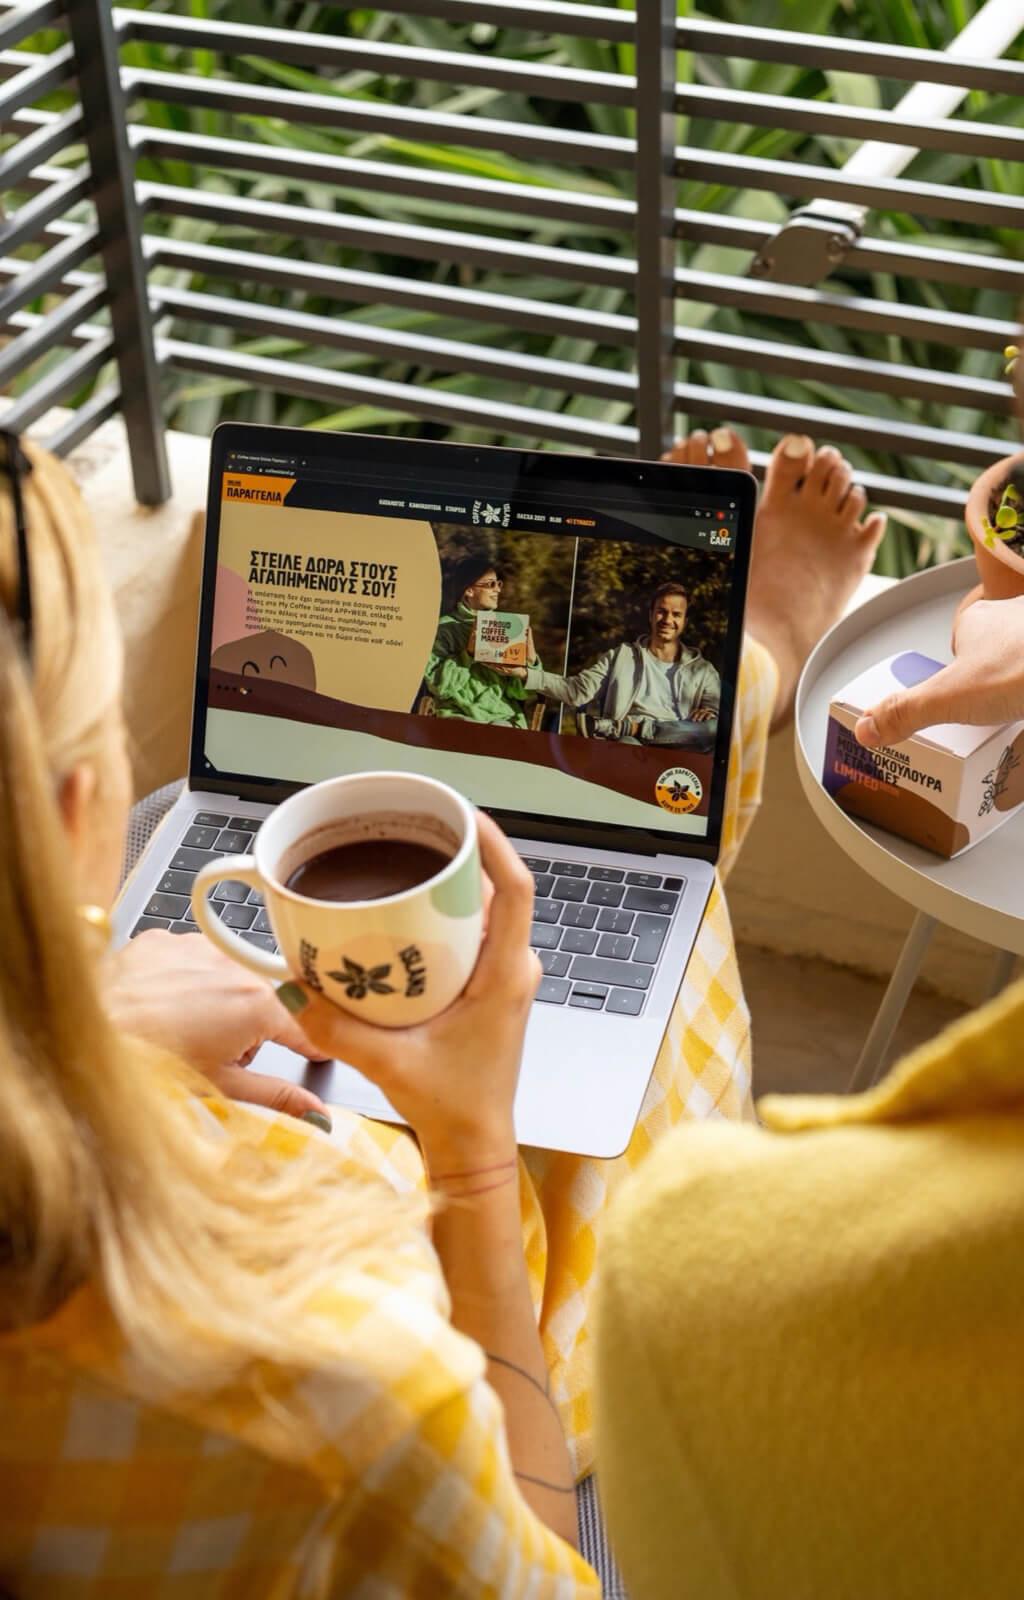 COFFEE ISLAND'S WEBSITE